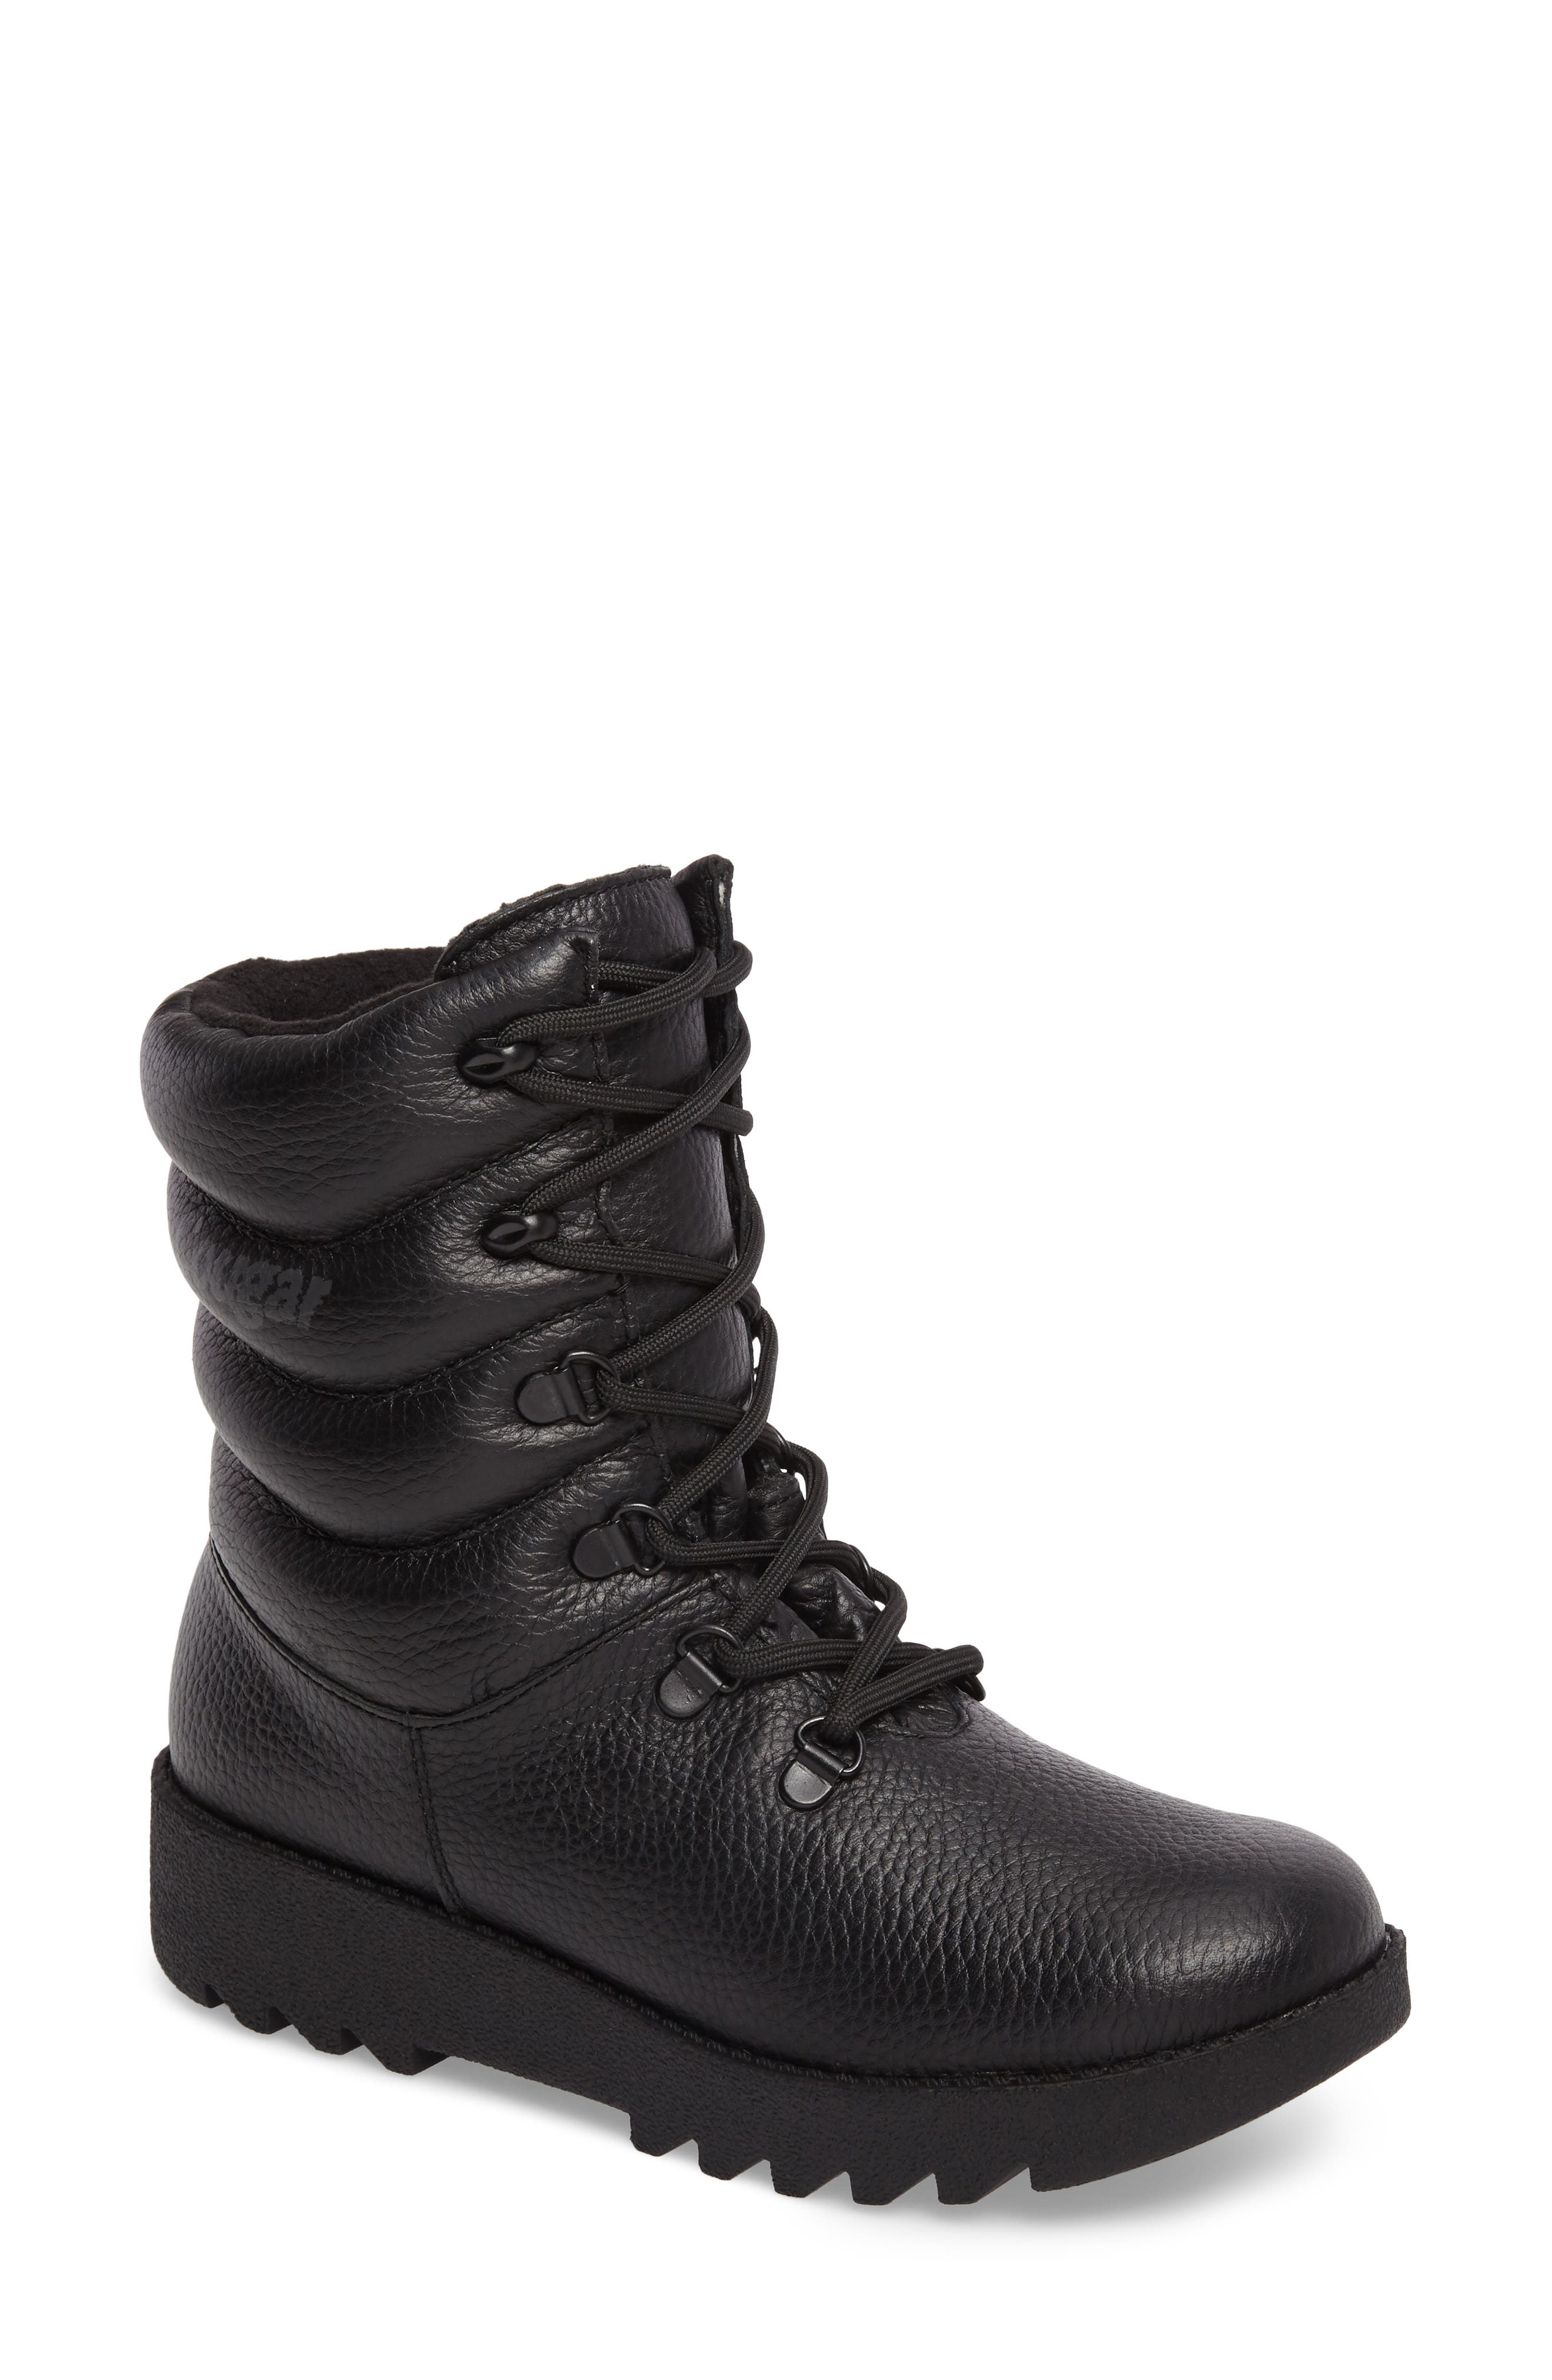 Blackout Waterproof Boot, Main, color, 001